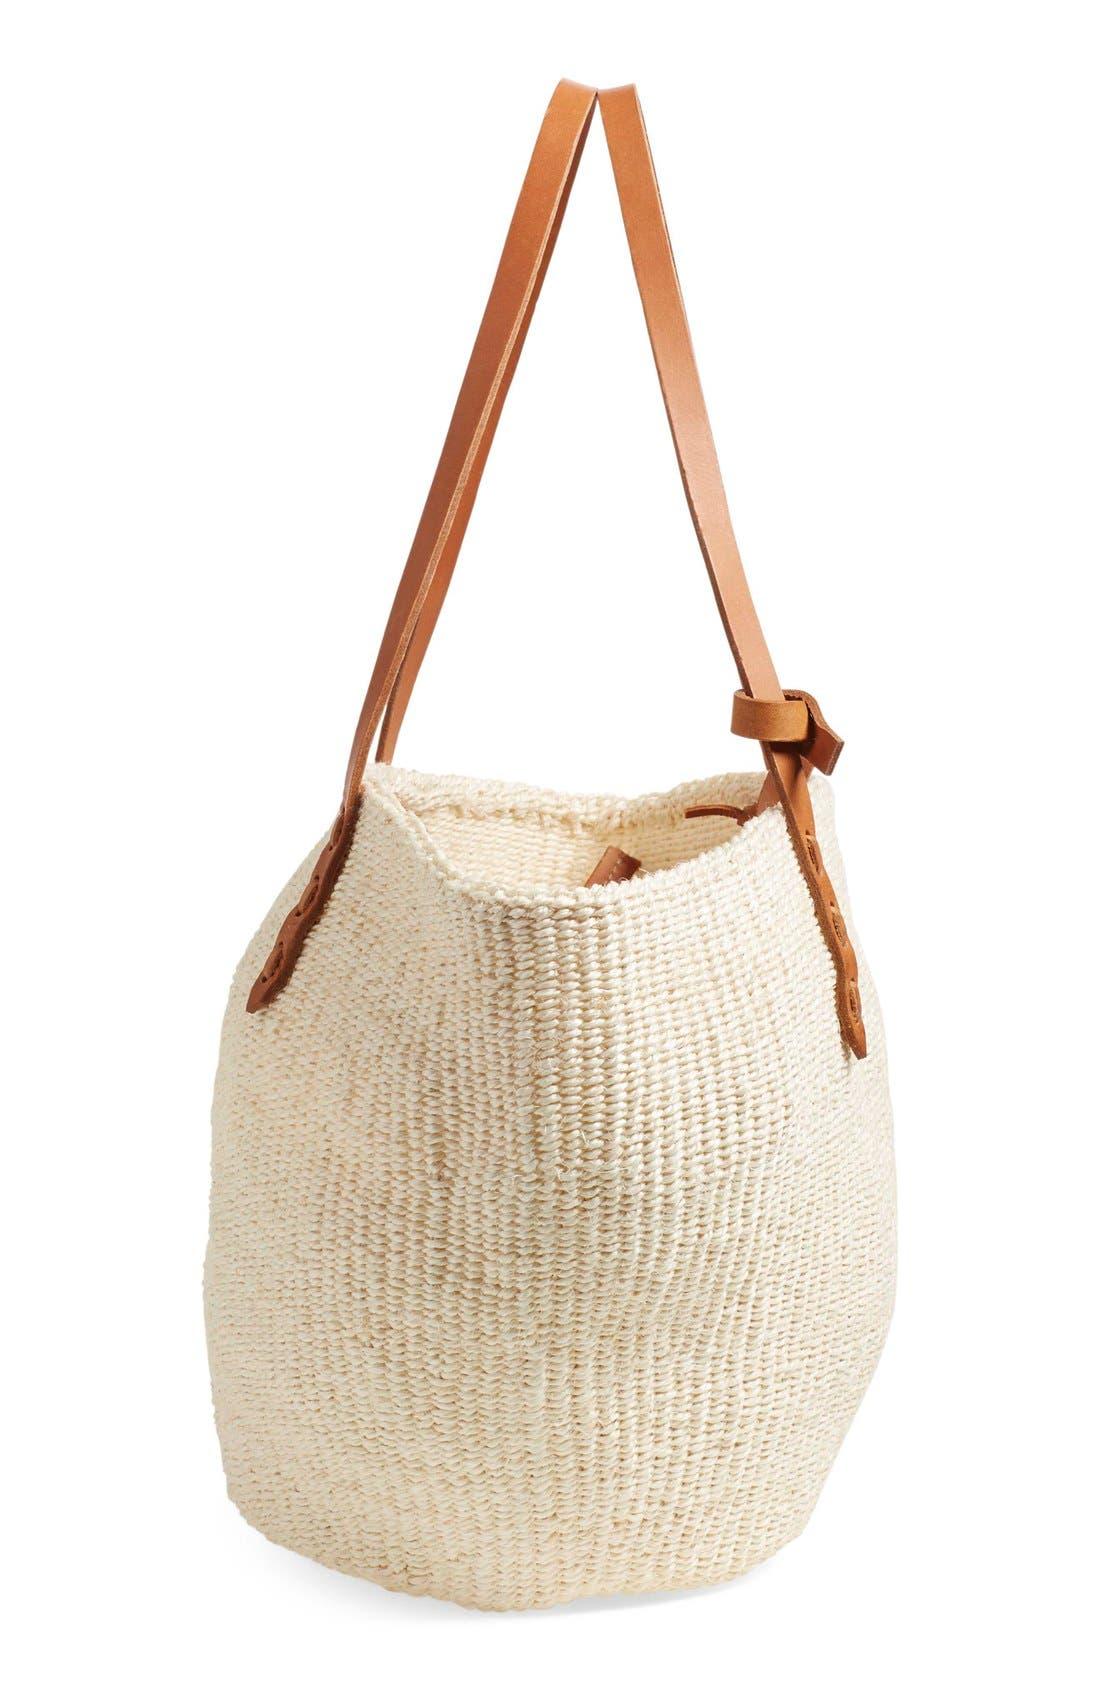 'Kenya' Sisal Shoulder Bag,                             Alternate thumbnail 2, color,                             900